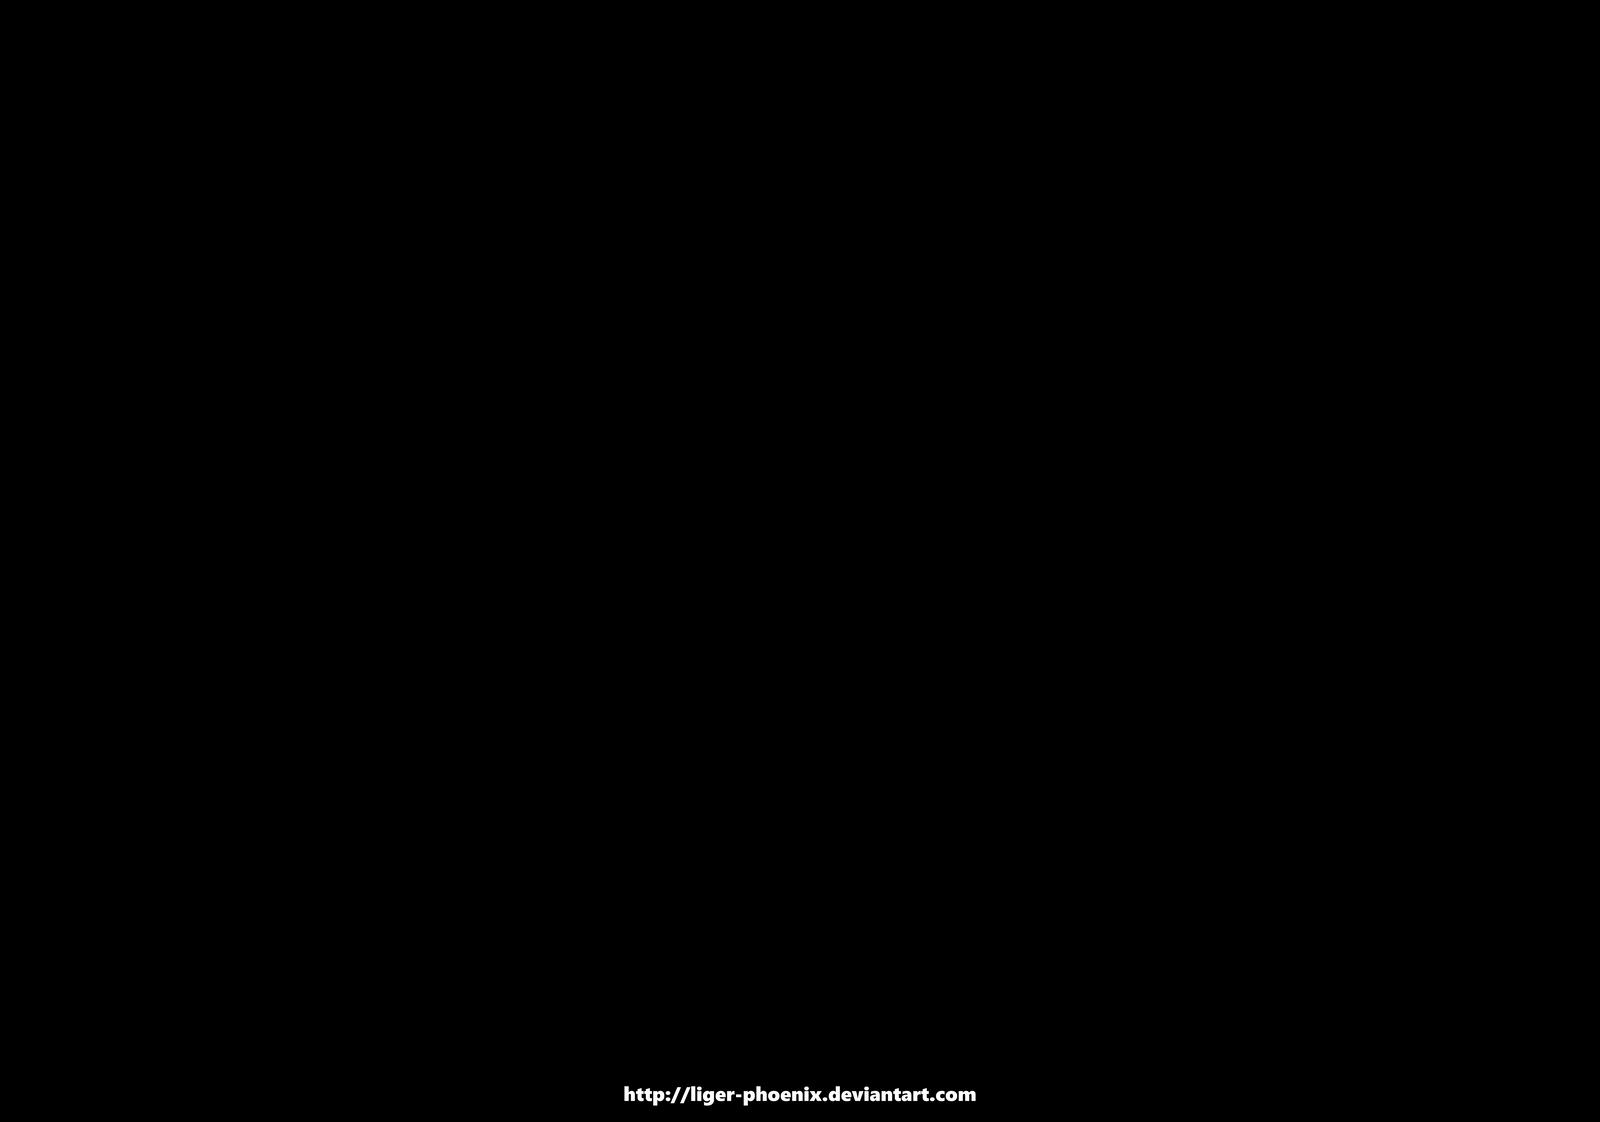 Sasuke Lineart : Uchiha sasuke lineart naruto by liger phoenix on